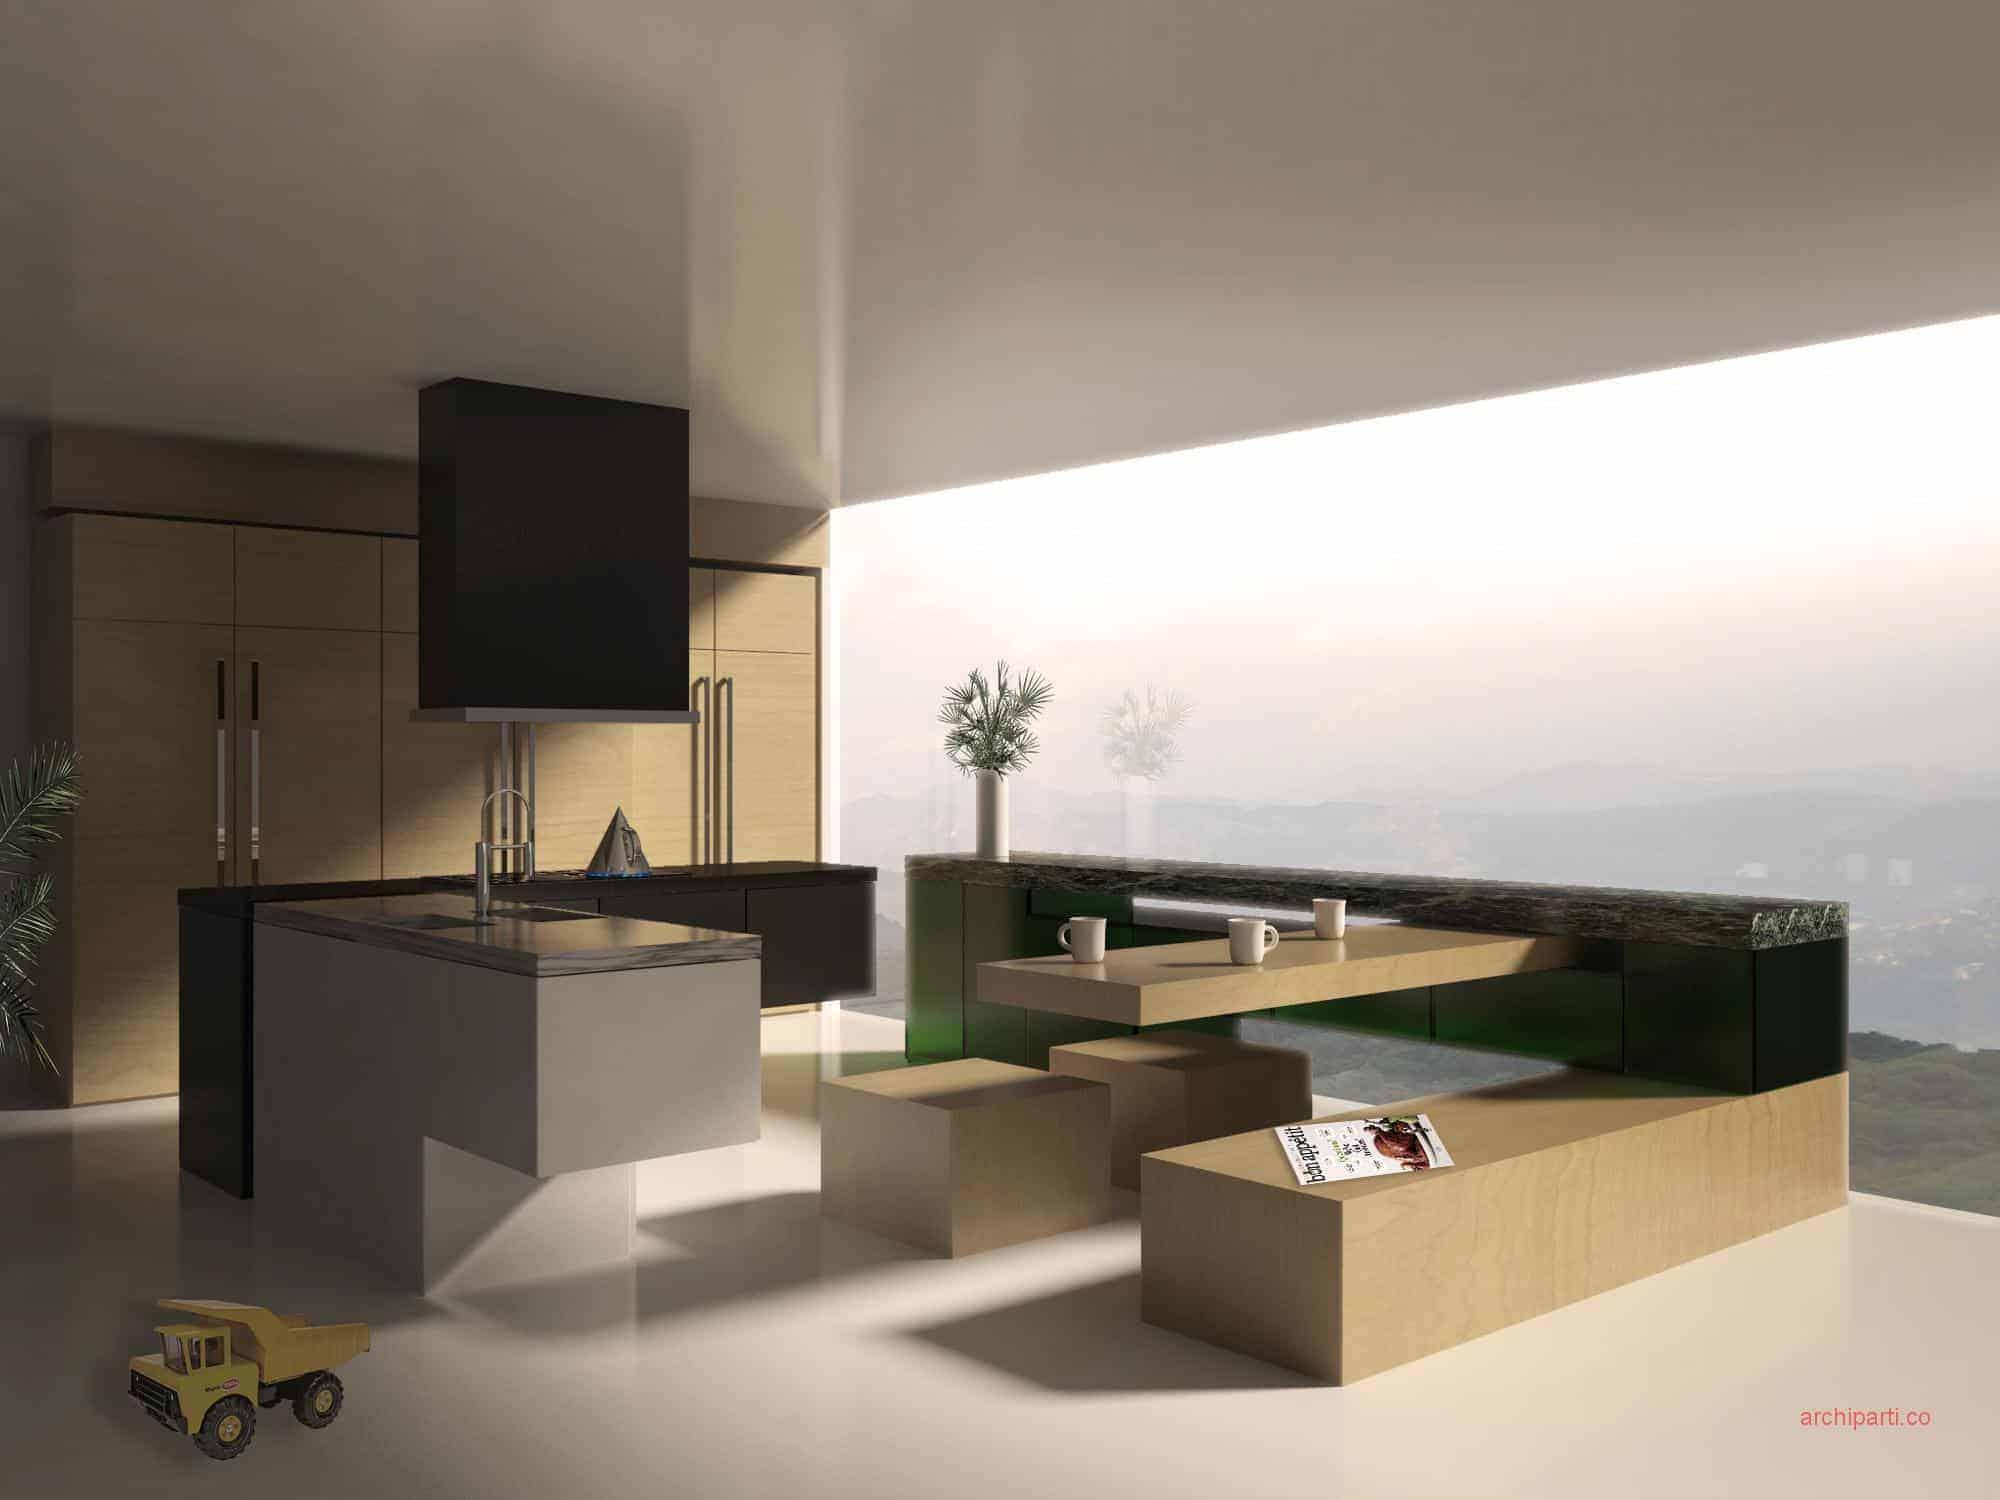 kitchen builder app moen high arc faucet 中西双厨 最厉害的现代厨房设计装修 你知道这23个秘密吗 公寓厨房设计